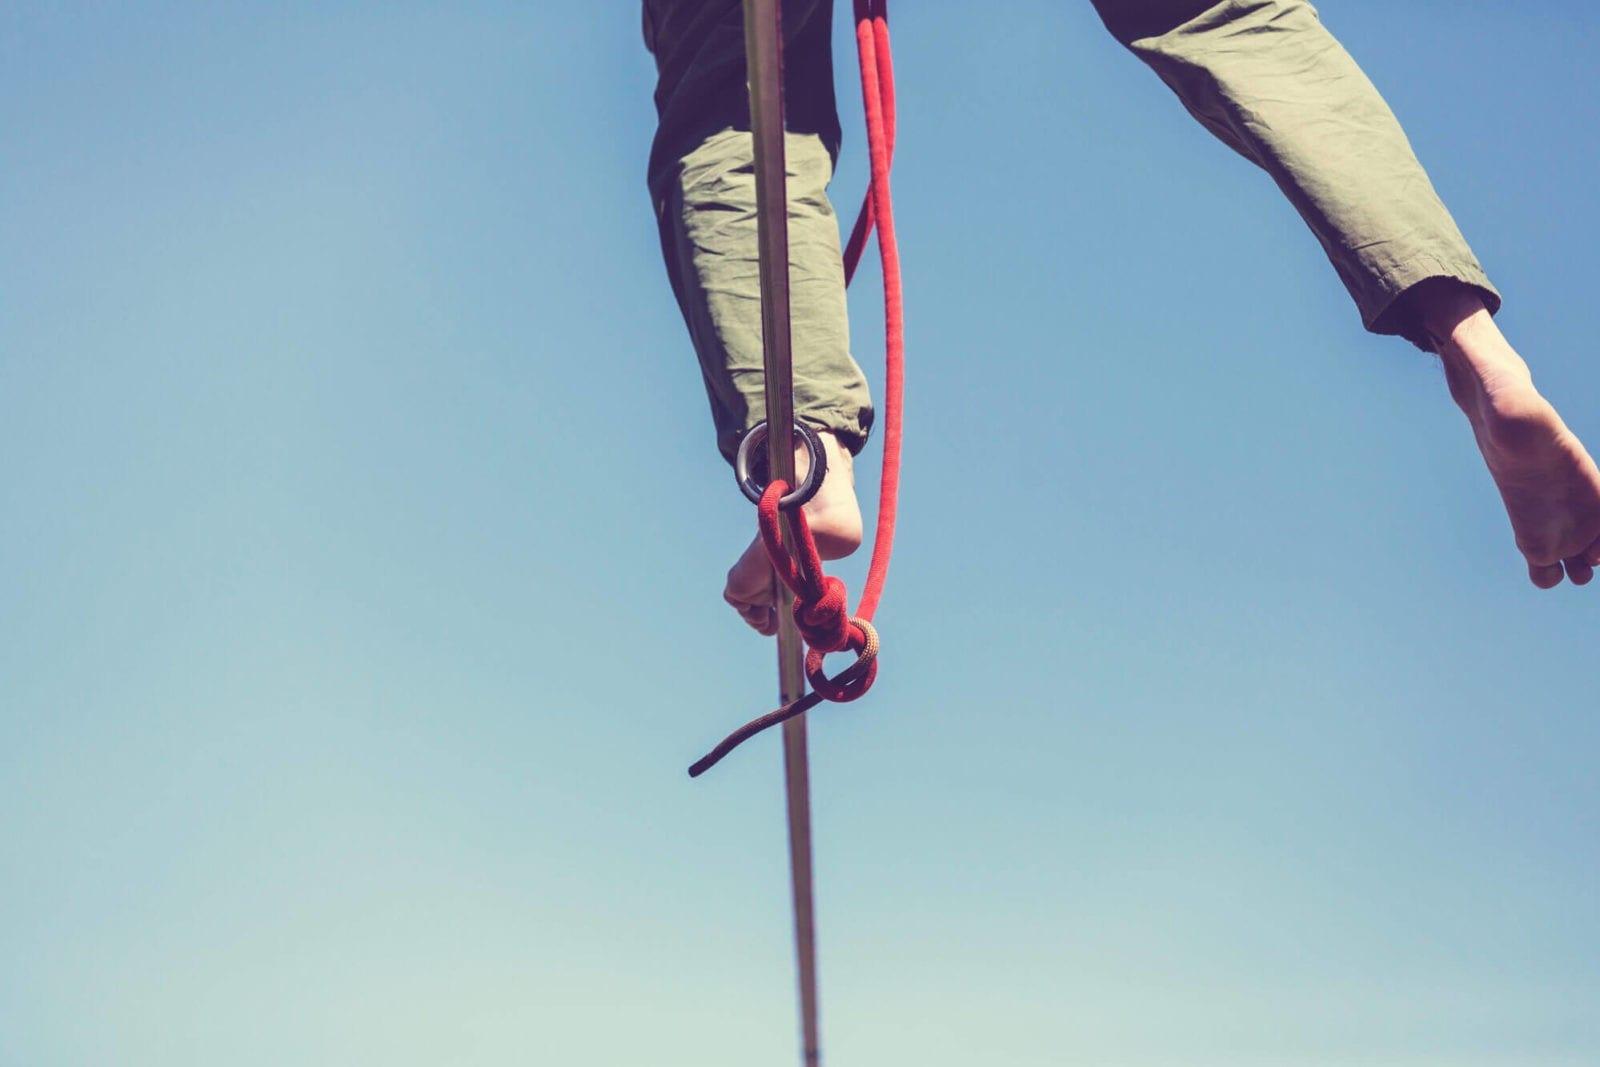 Entenda como o slackline auxilia na prática de outros esportes